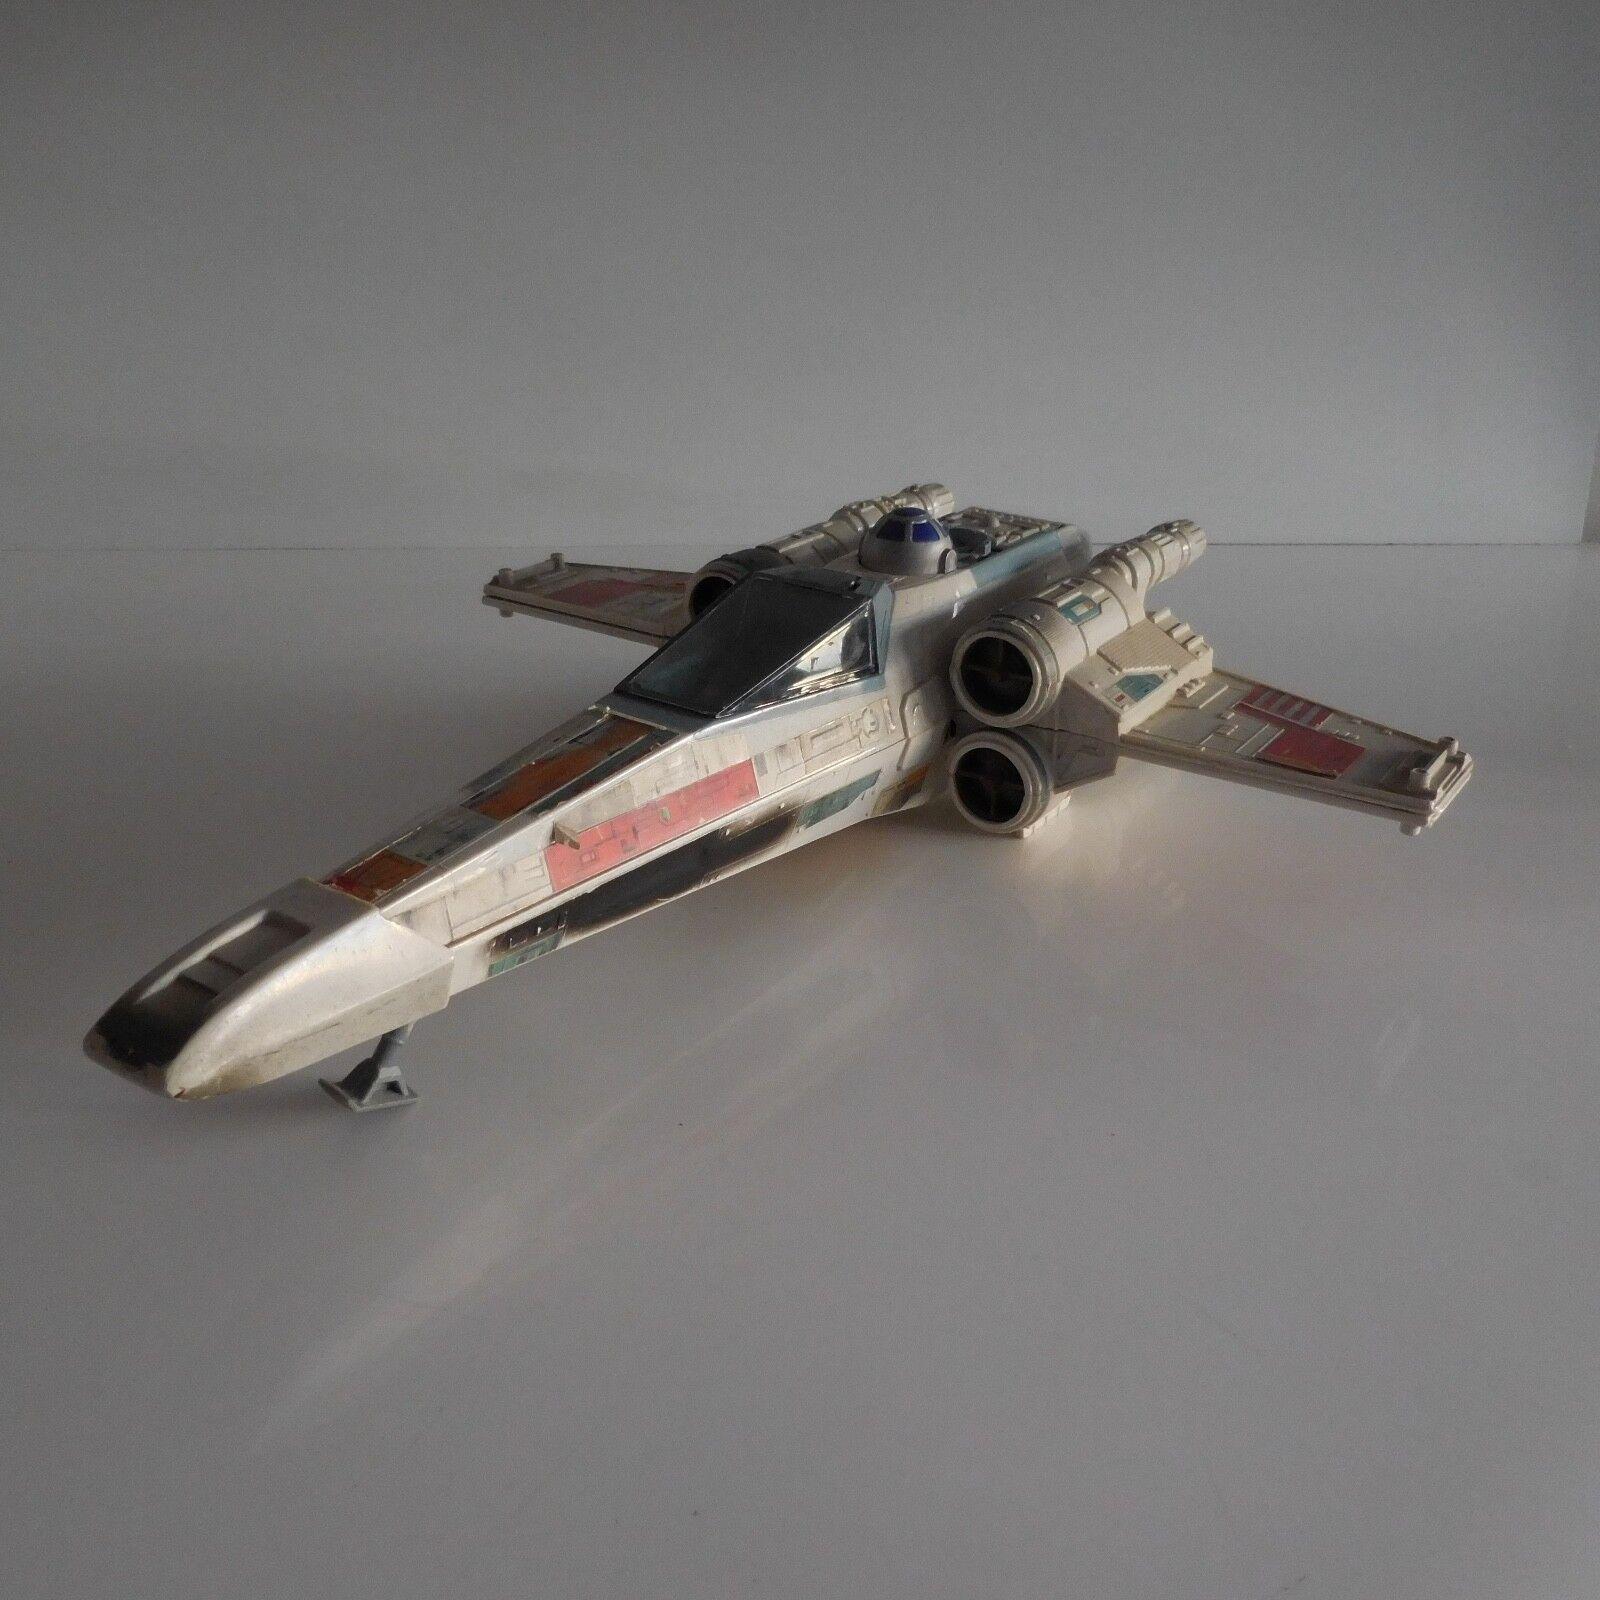 Véhicule science-fiction navire spatial miniature Tonka 1995 LUCASFILMS